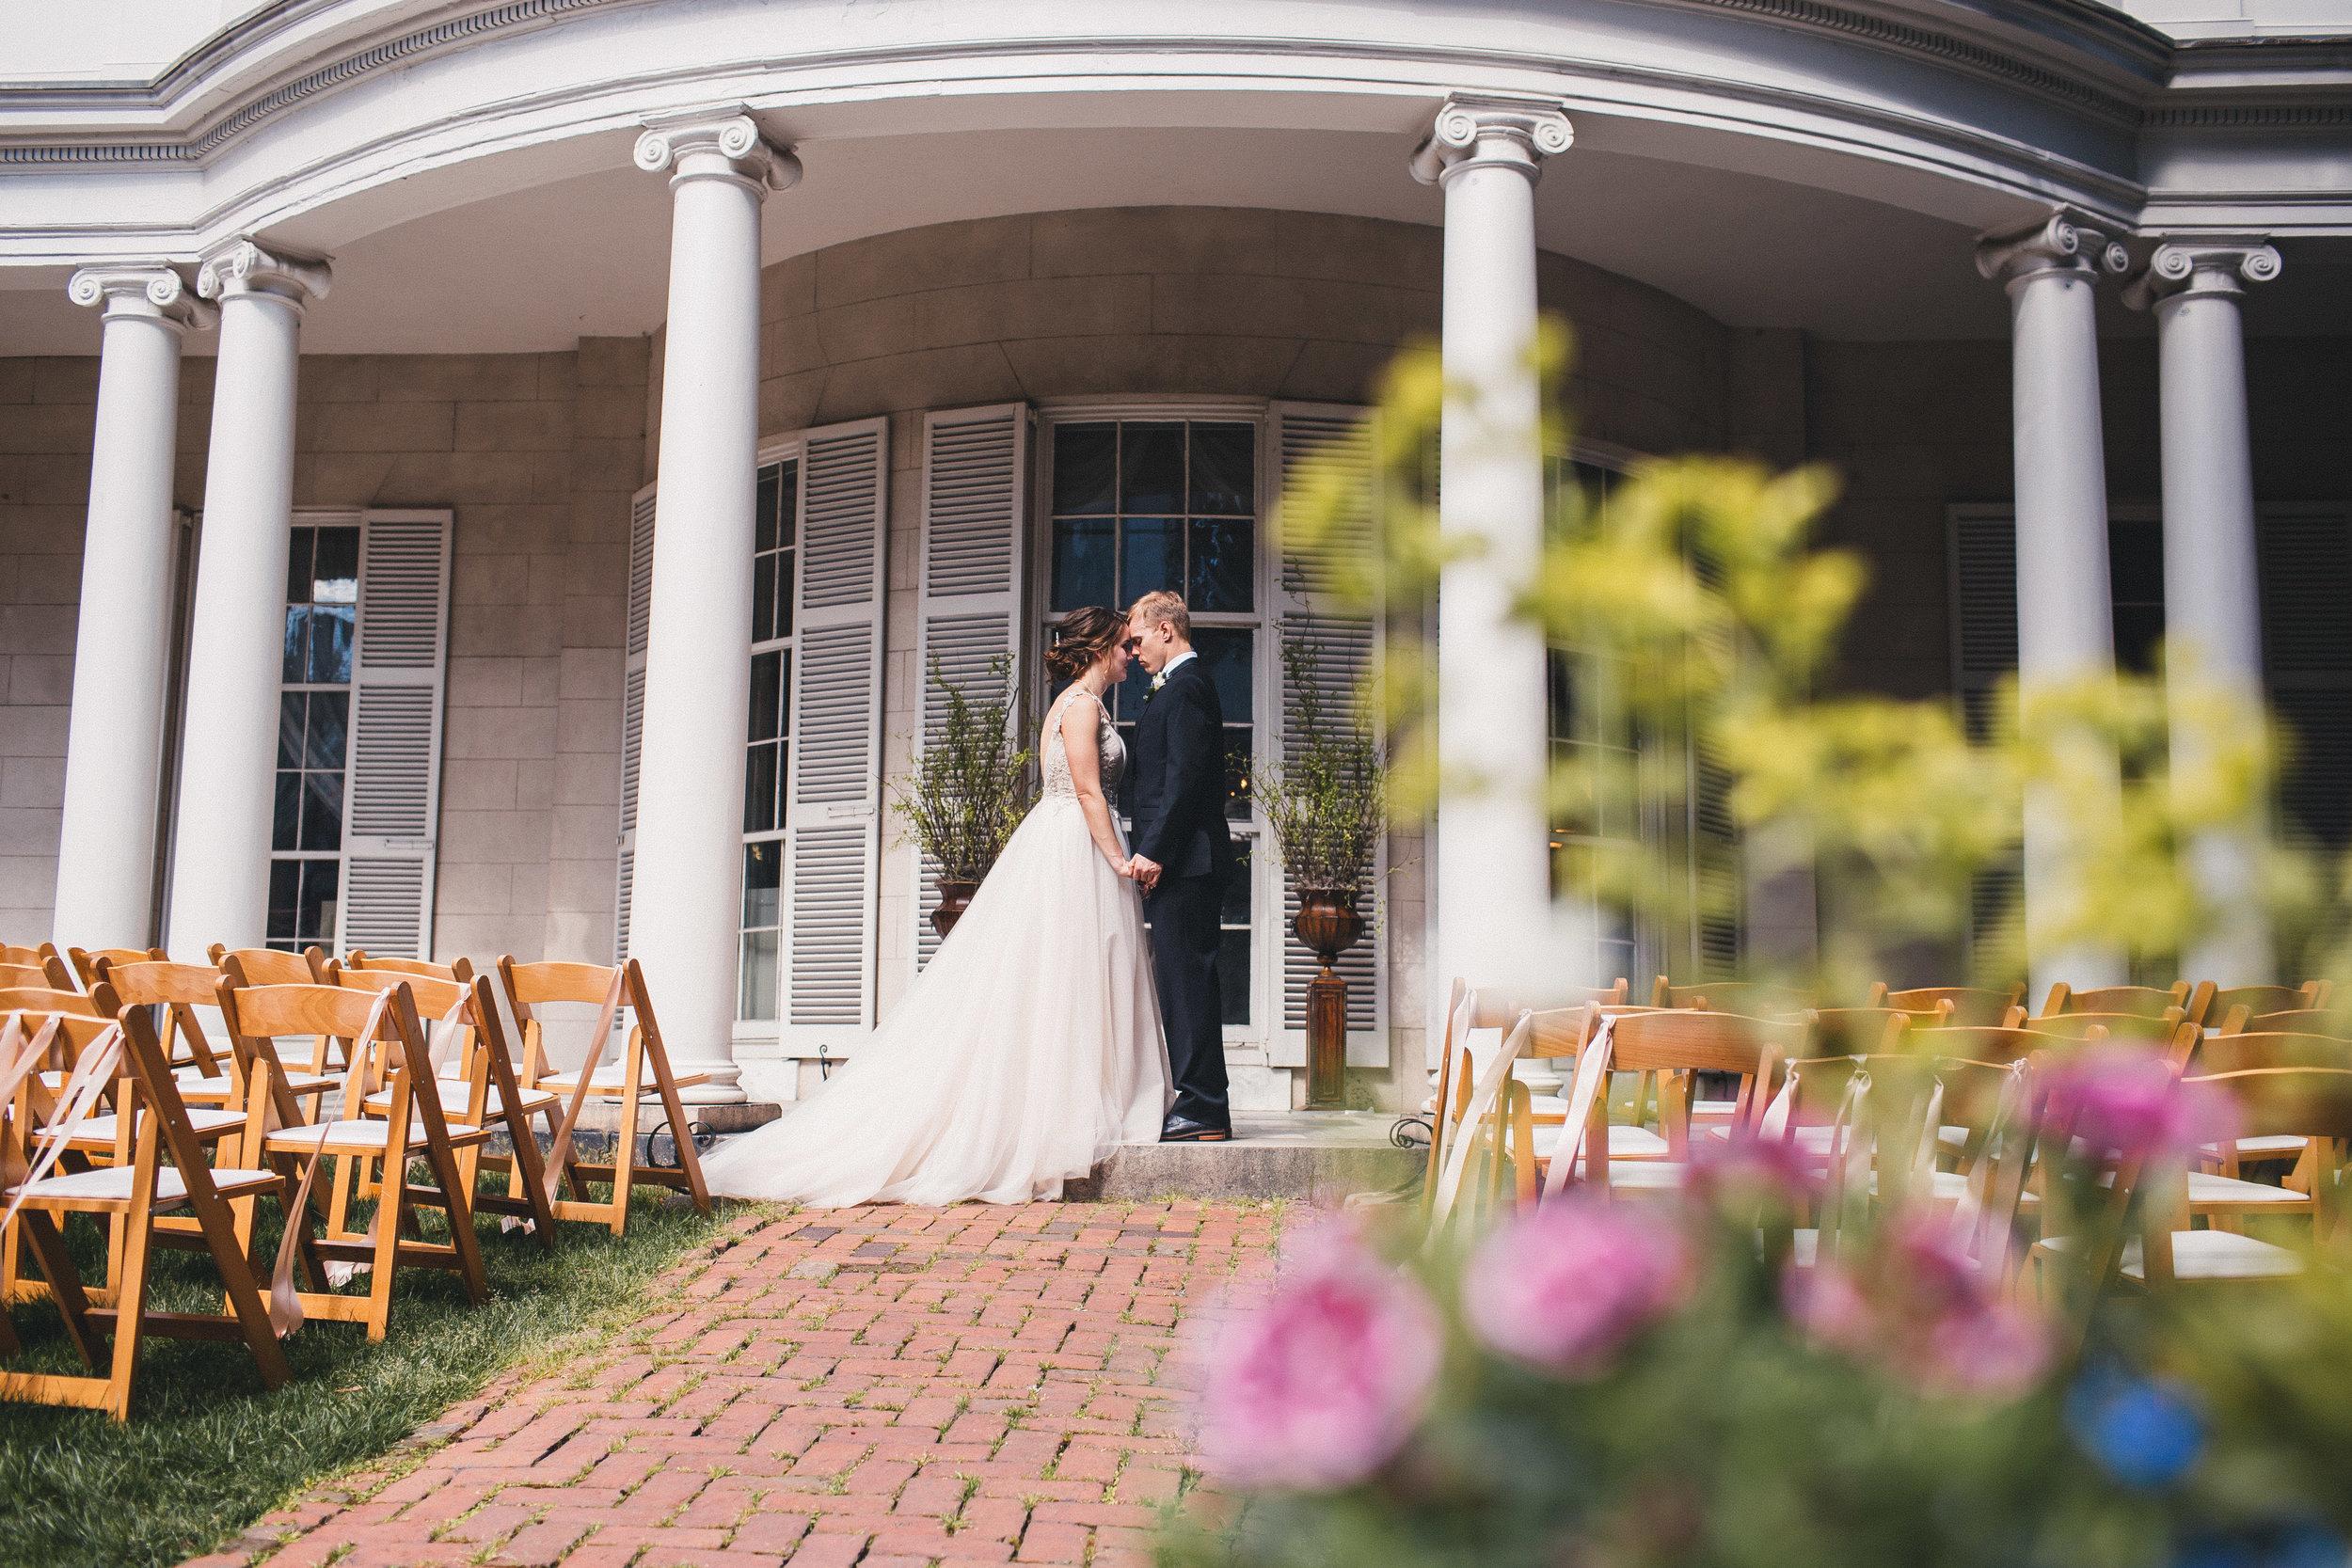 Lindsey & Bert - Wedding 4.1.17-409.jpg